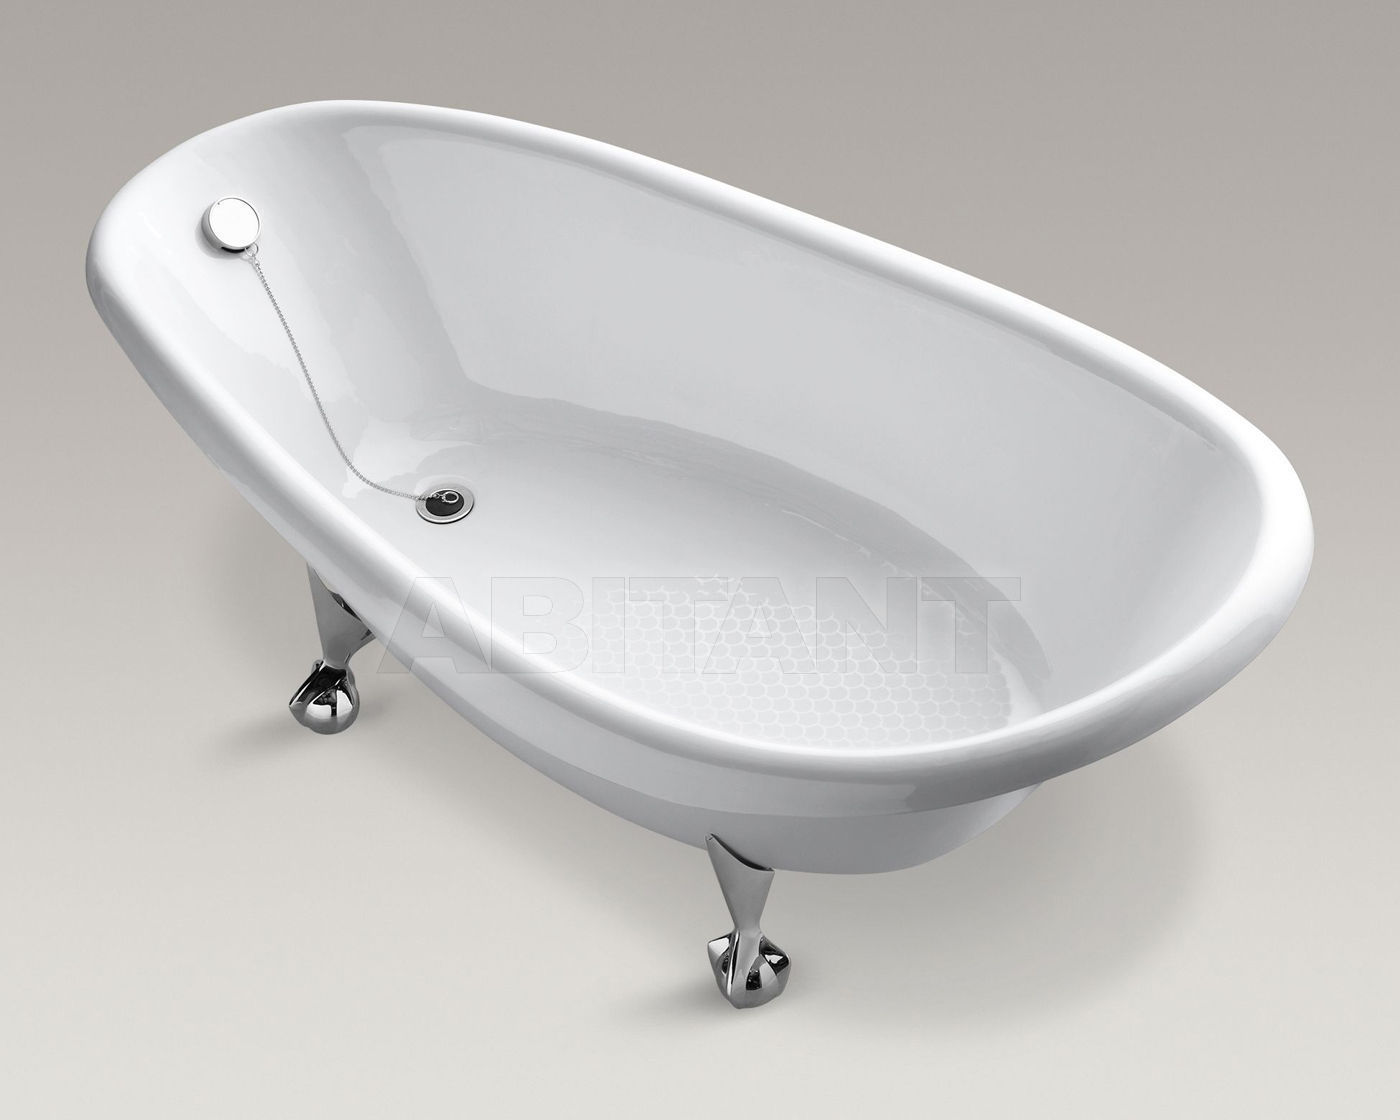 Kohler Vasca Da Bagno : Ванна birthday bath белая kohler k каталог сантехники